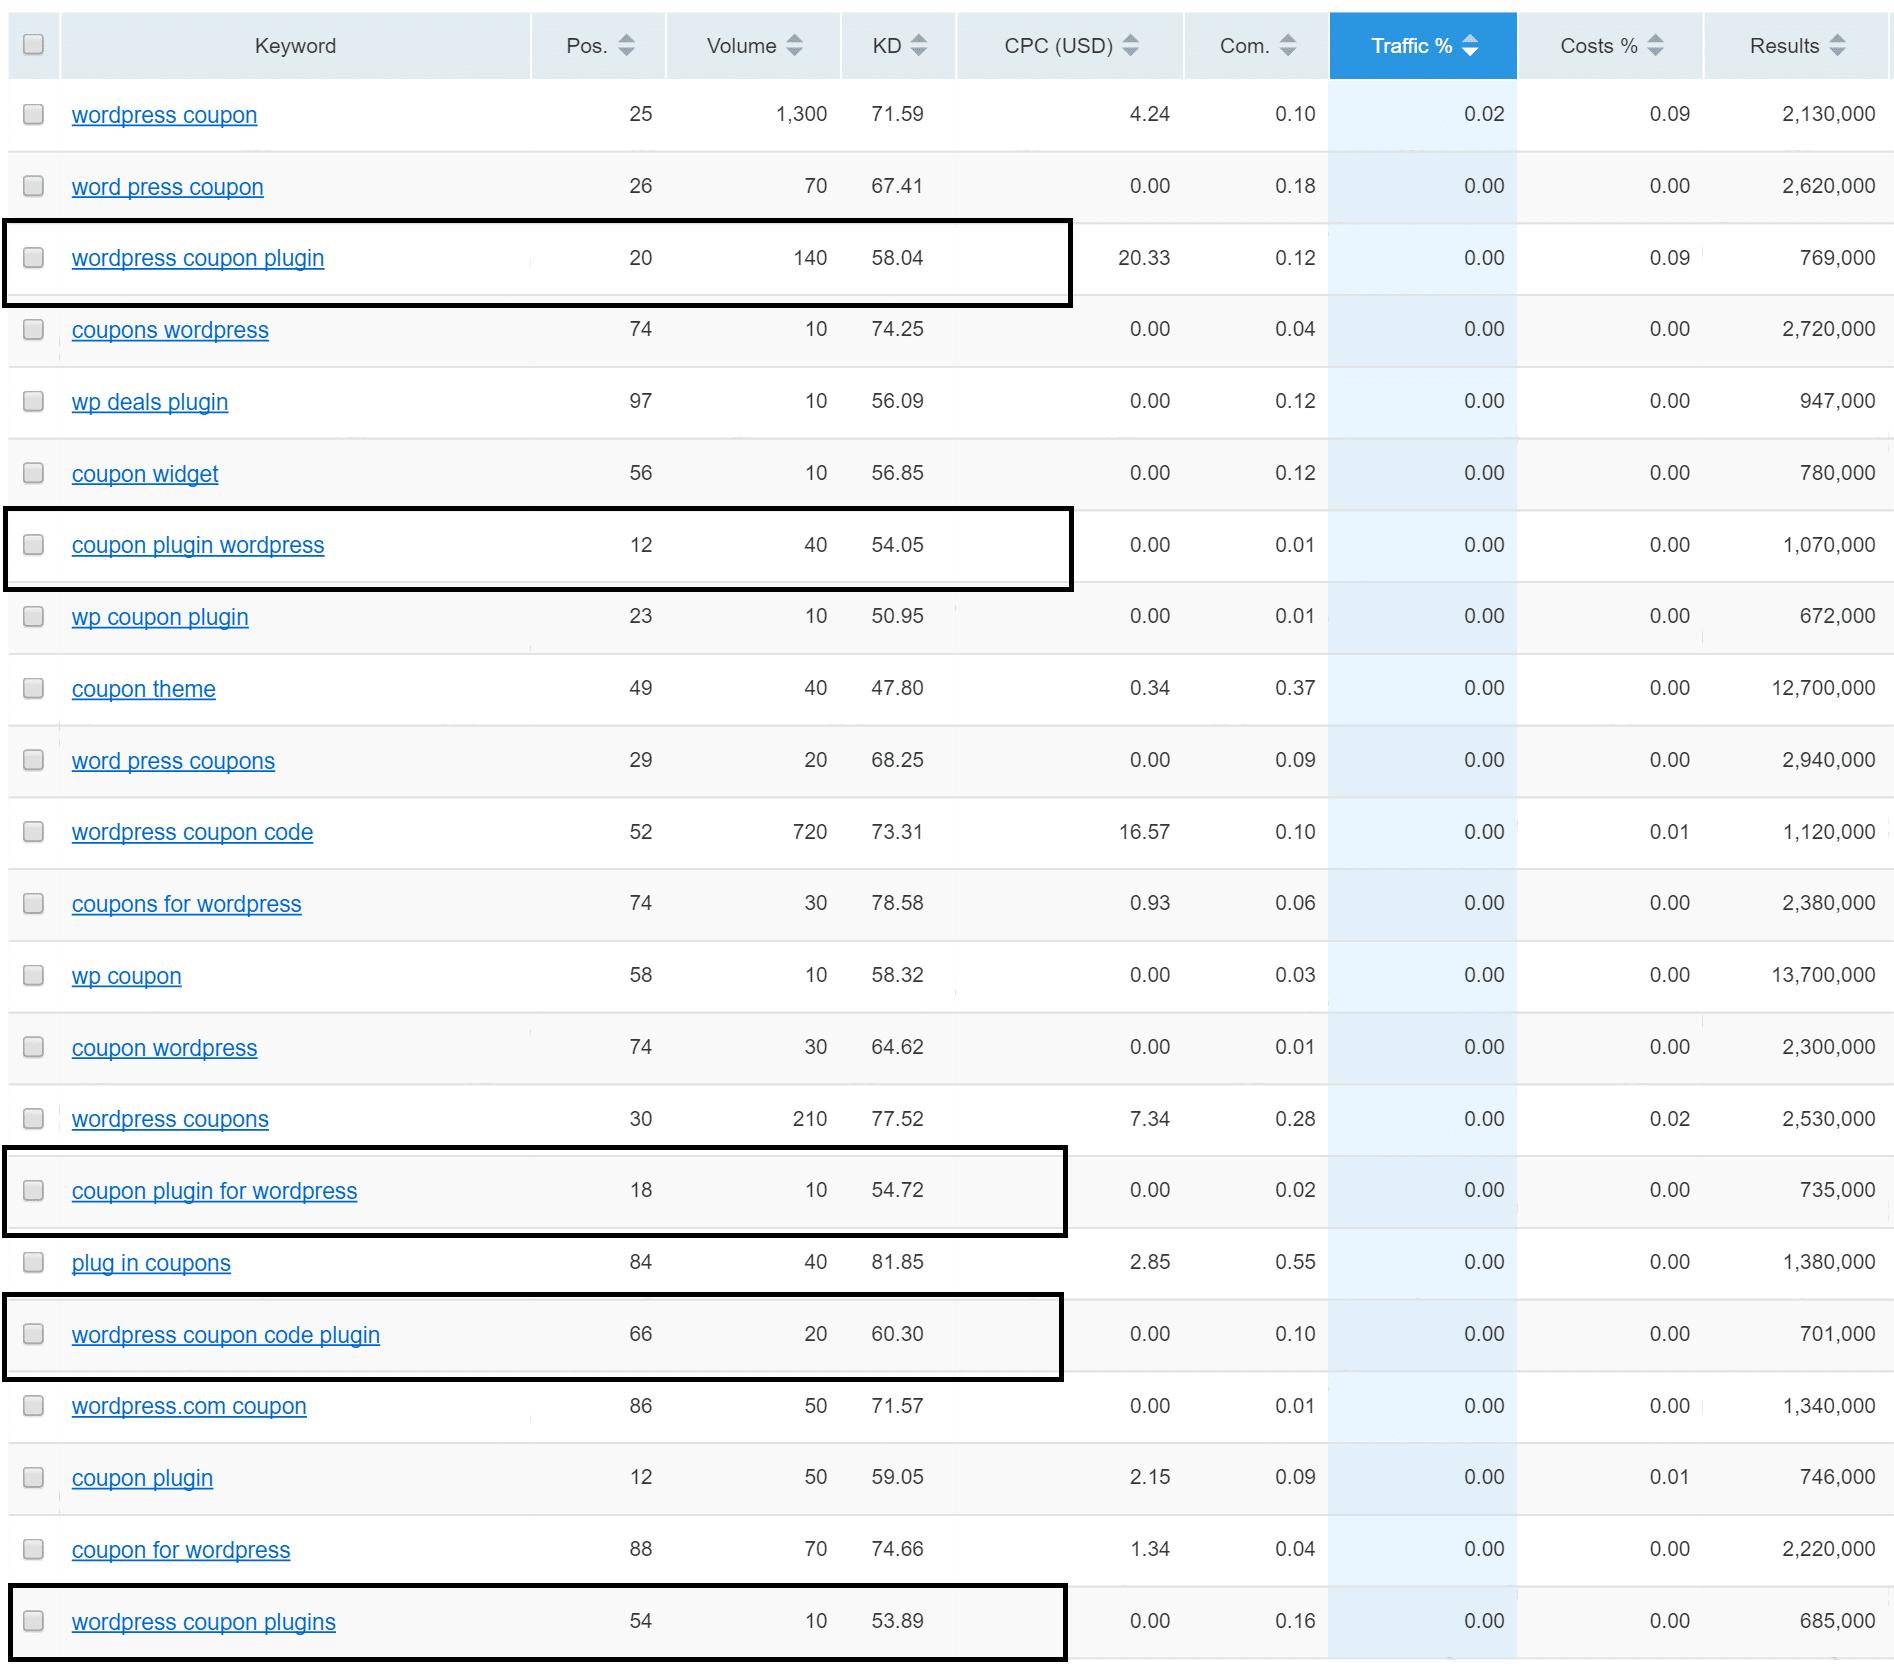 SEMrush current rankings